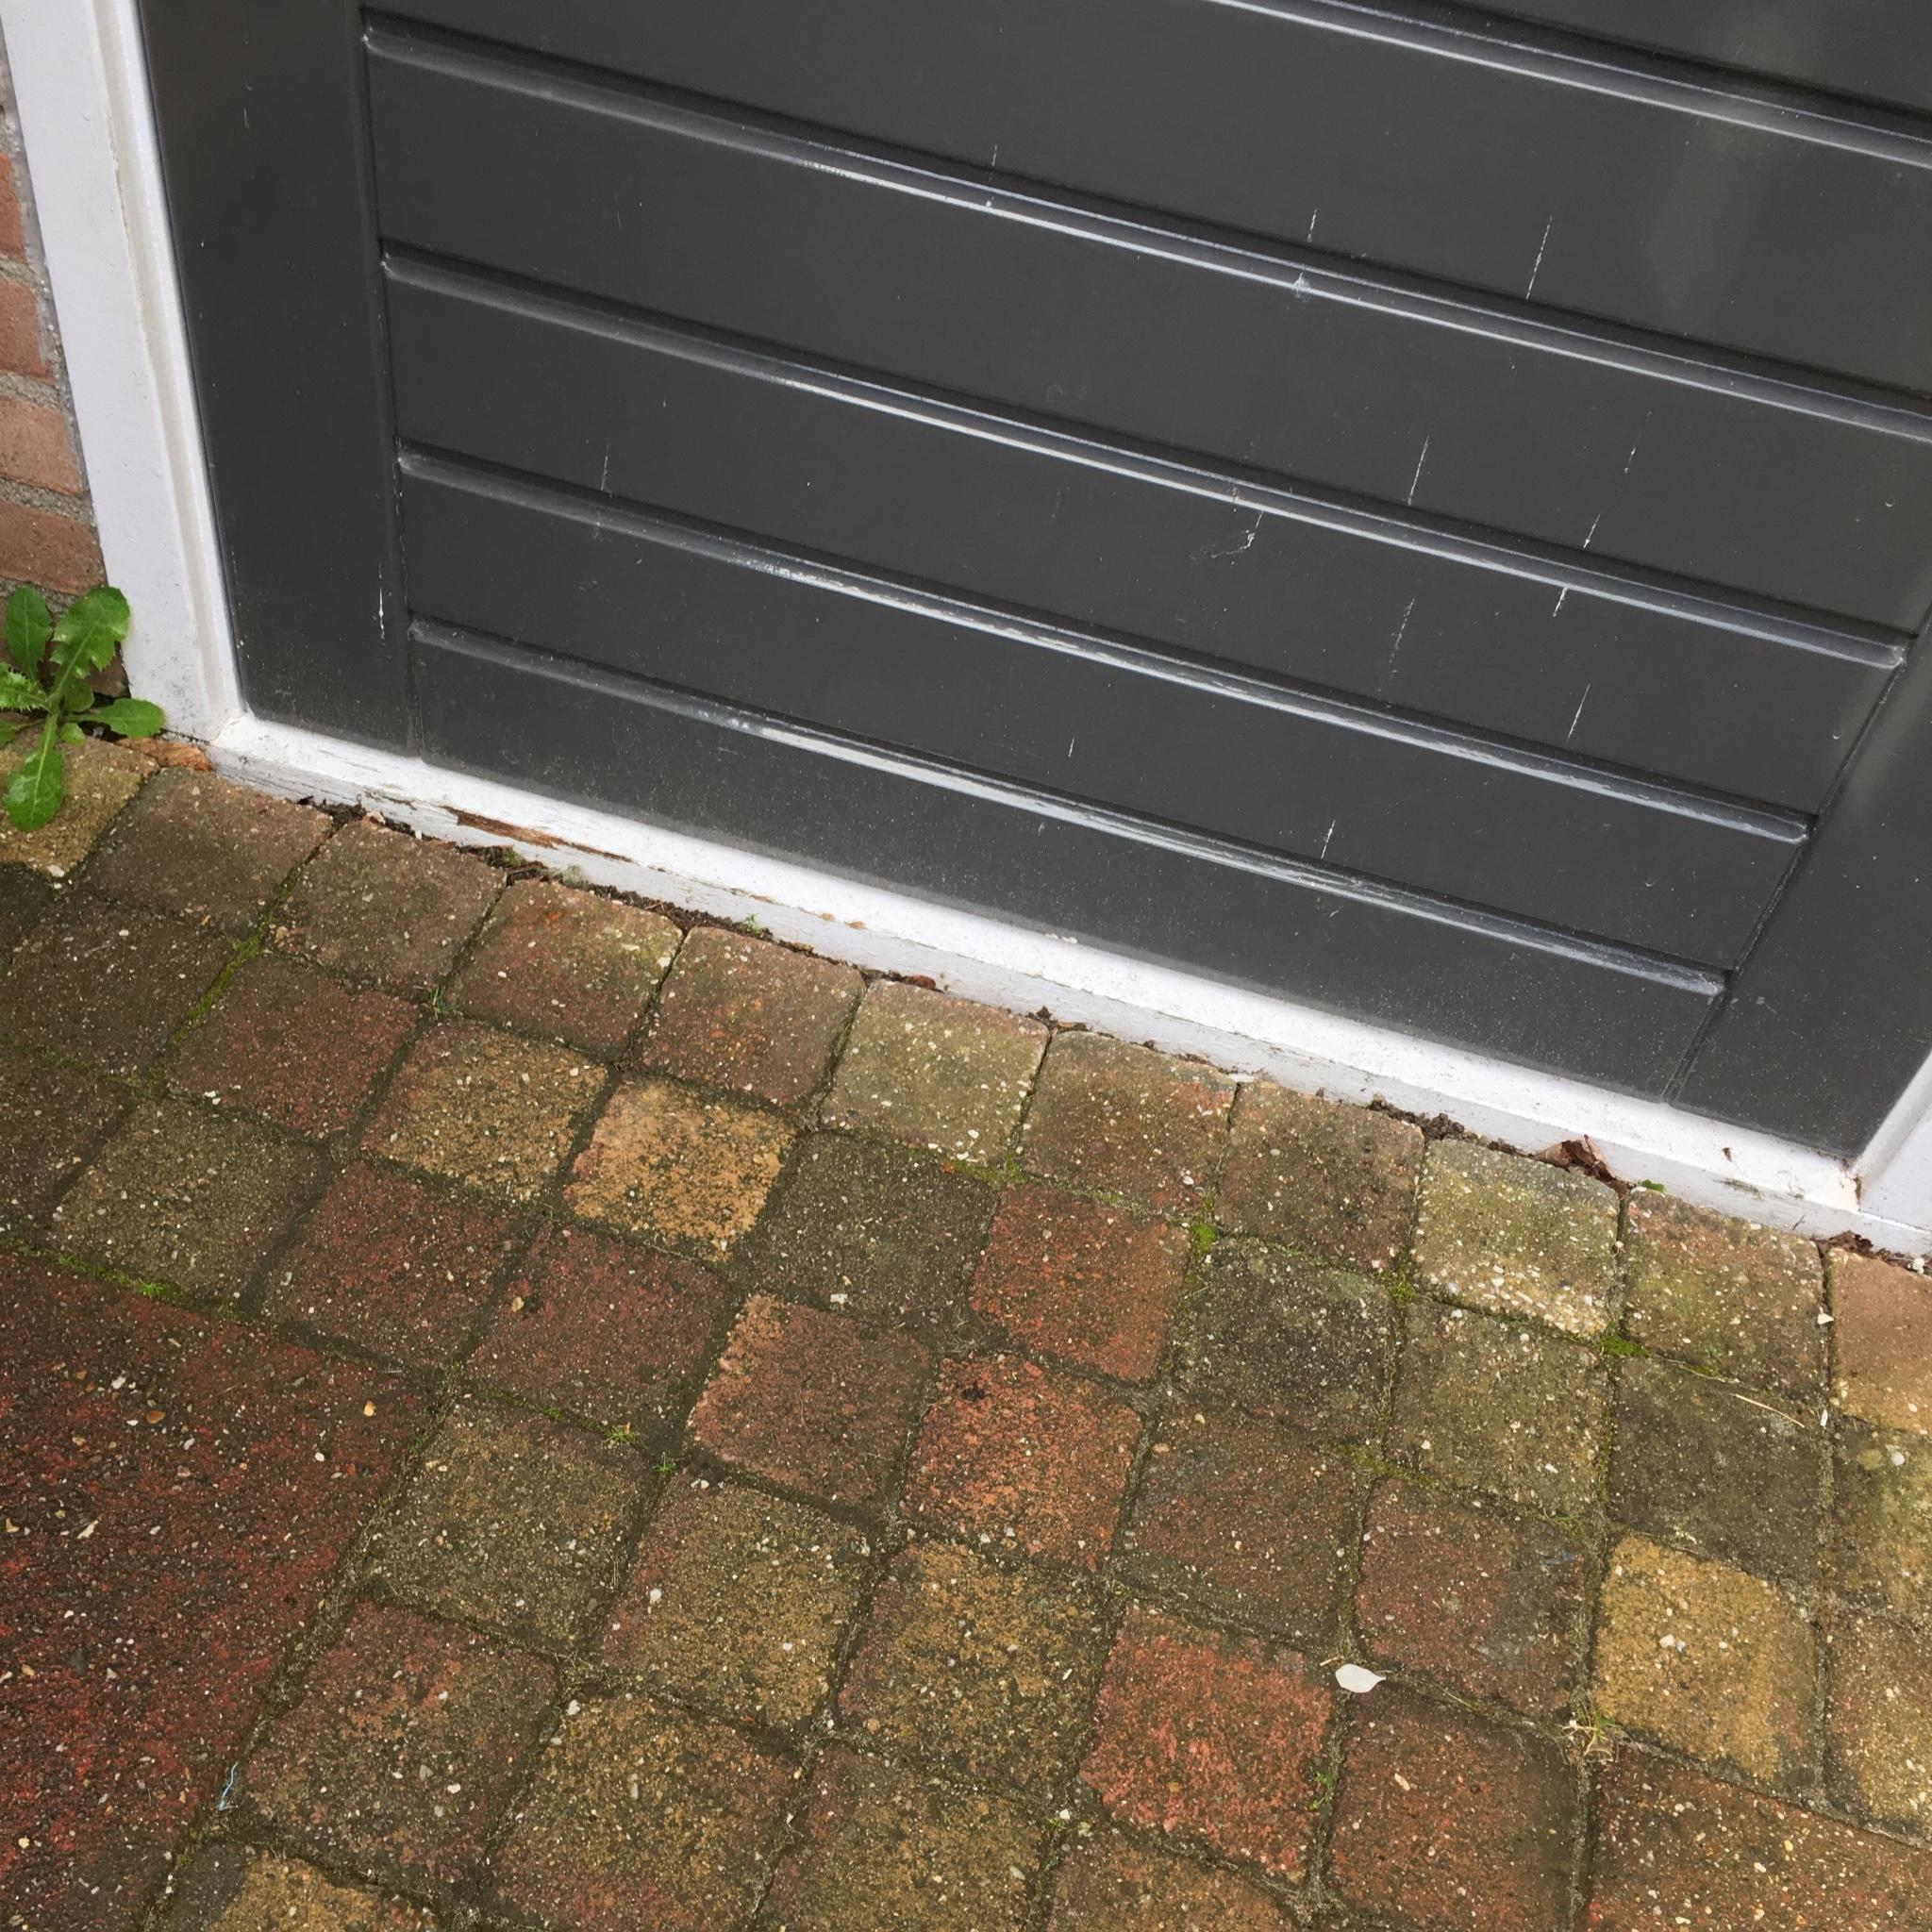 Super Onderdorpel buitendeur vervangen door kunsstof dorpel. - Werkspot LM11